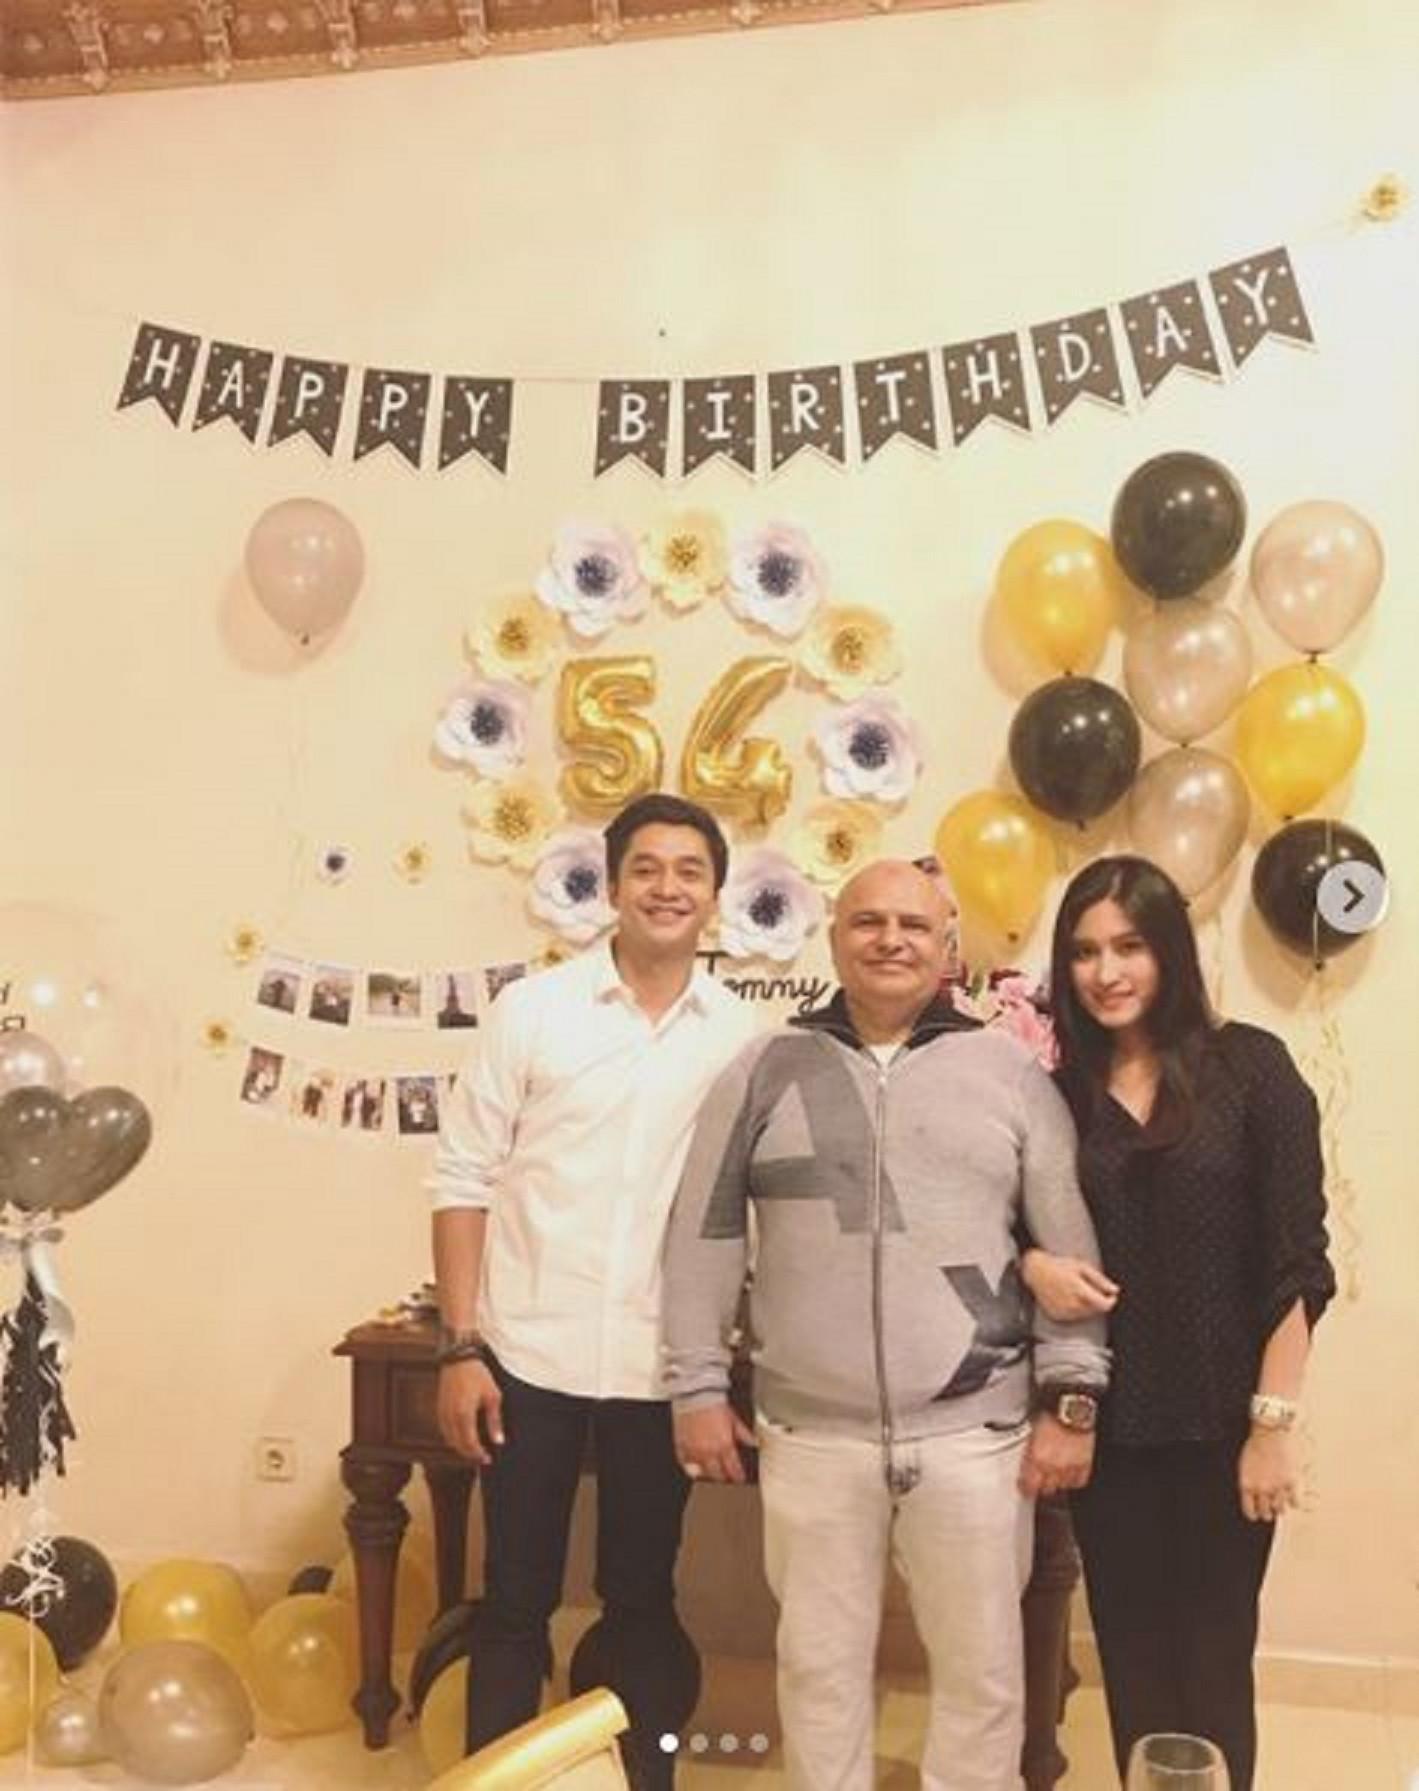 Adly Fairuz ikut merayakan ulang tahun ayah Angbeen Rishi (Instagram/@angbeenrishi)